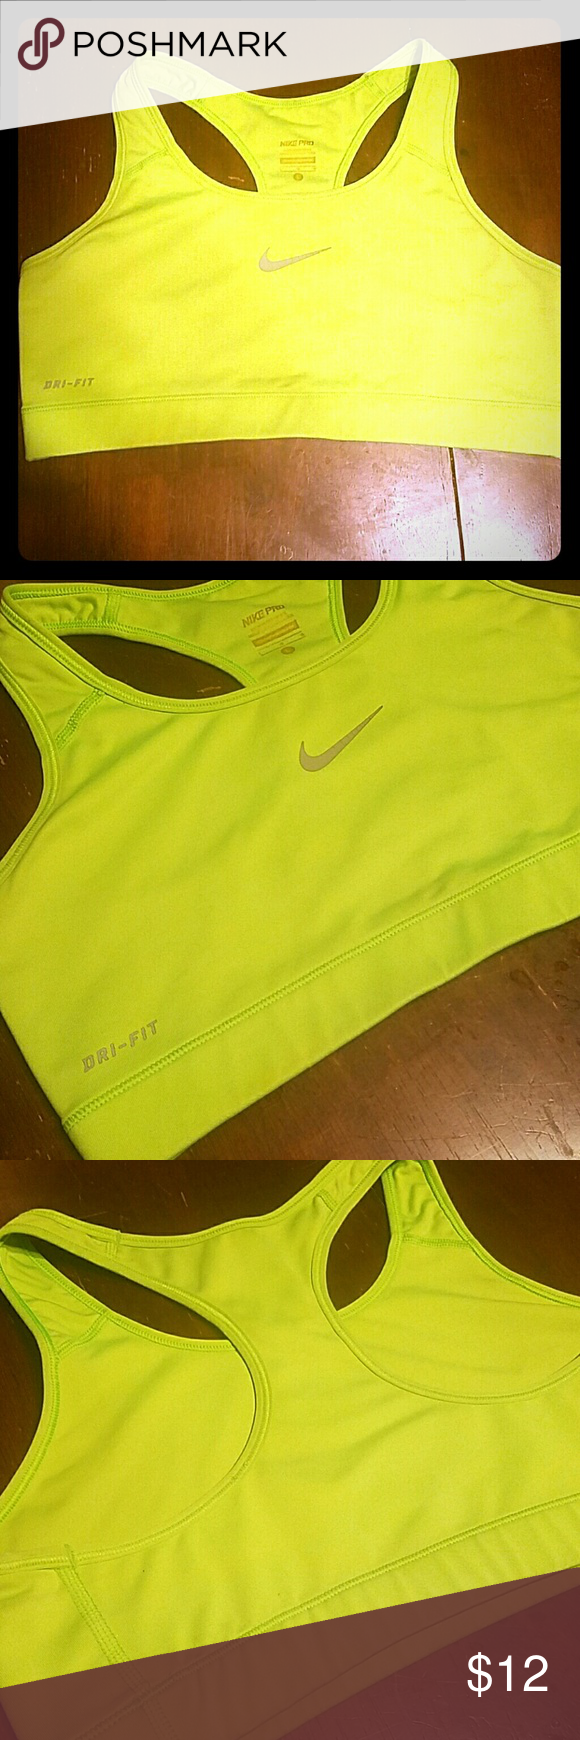 Nike Sports Bra Lime green Nike Sports bra. Great condition! Size Large Nike Intimates & Sleepwear Bras